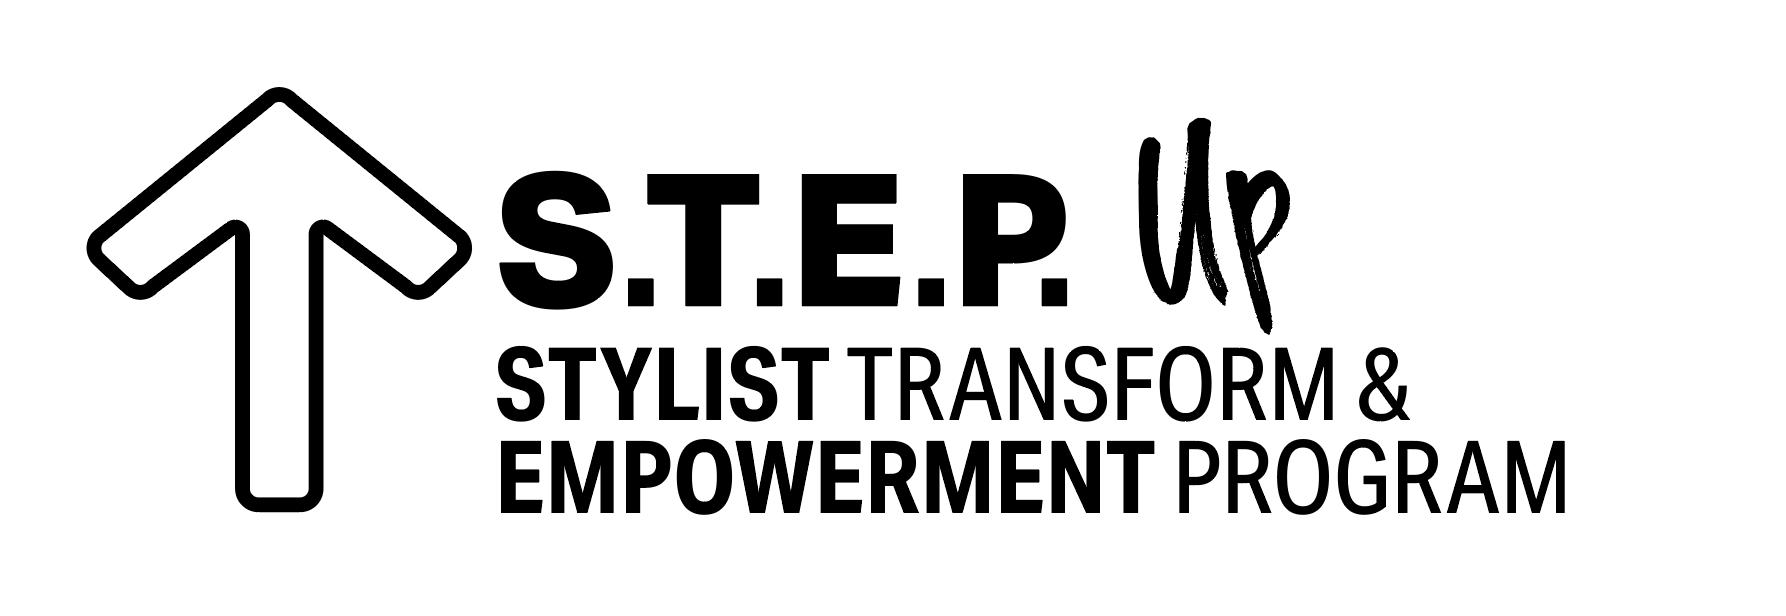 Pravana Launches Stylist Transform and Empowerment Program